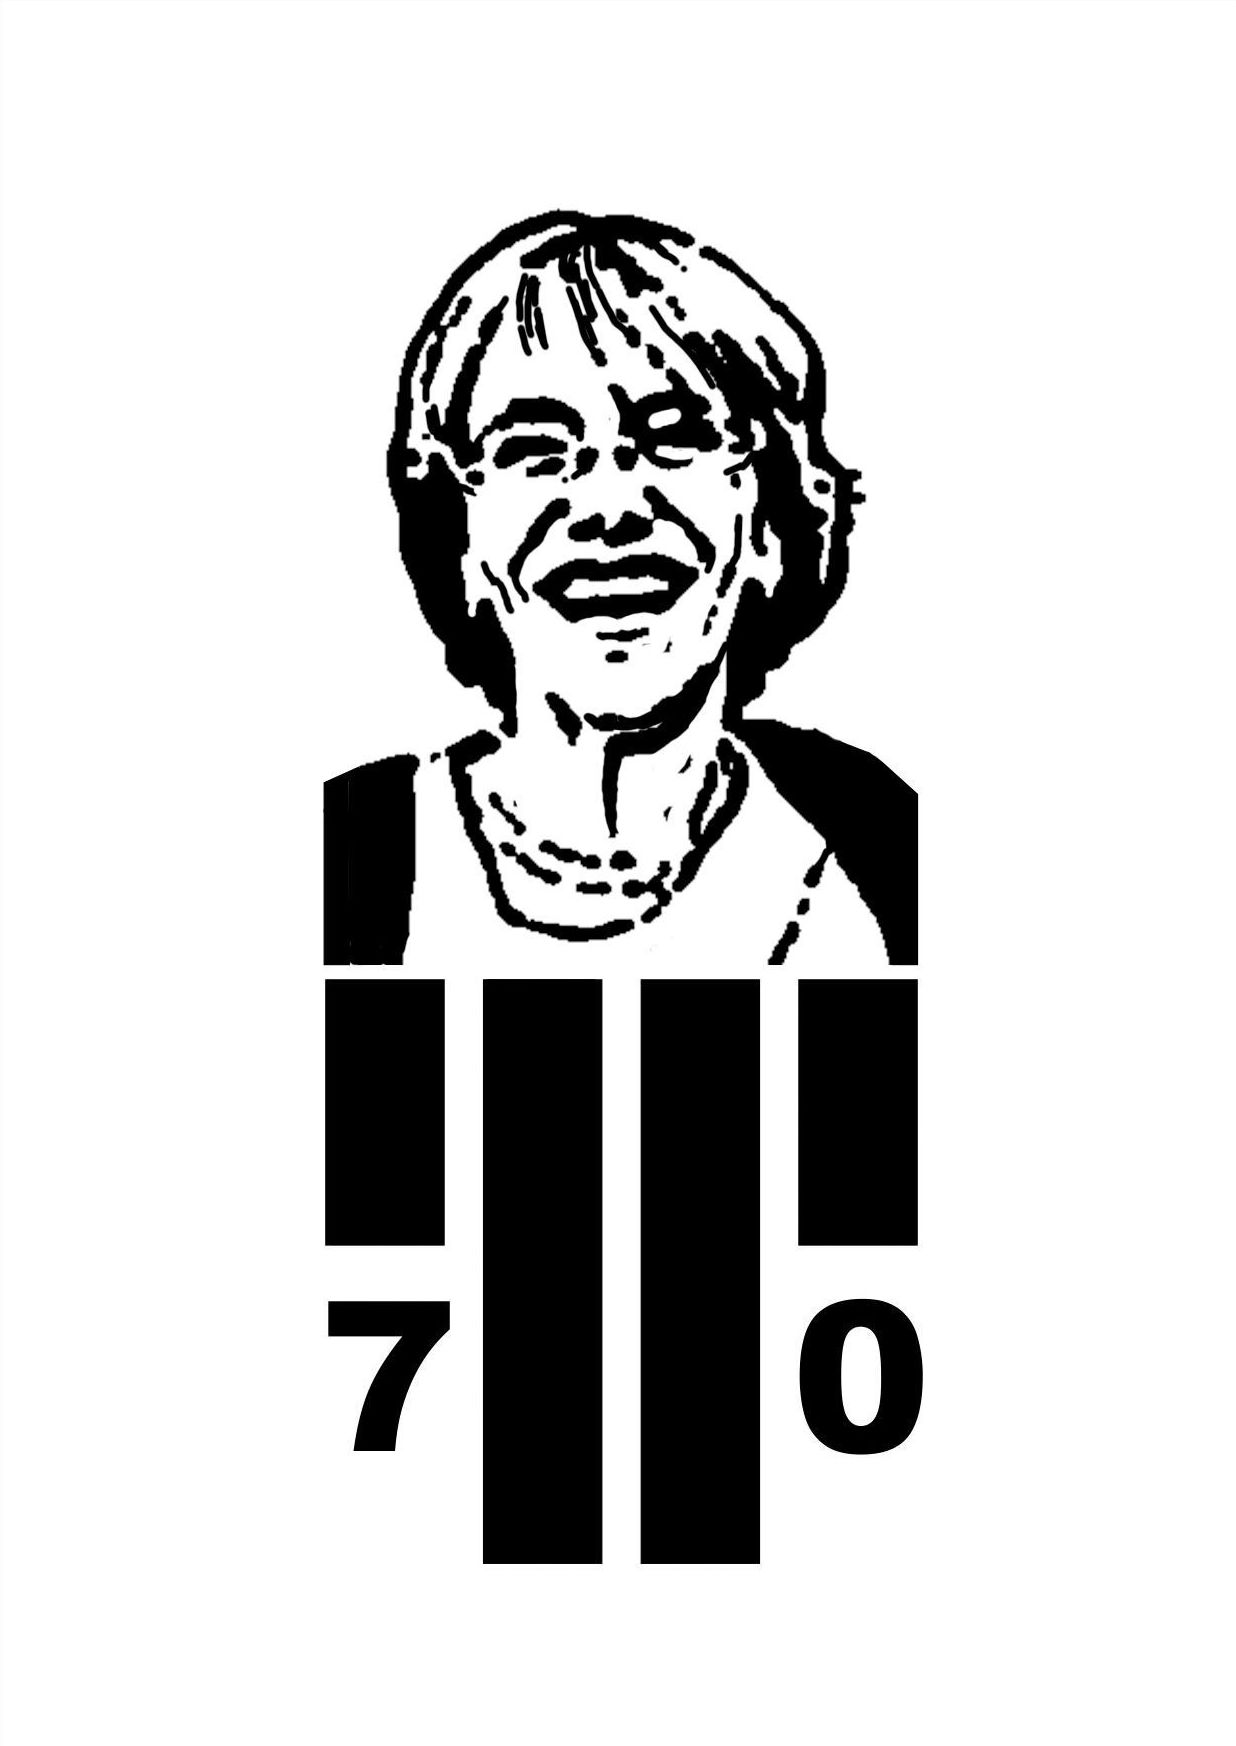 Logo aniversario, Logo individual